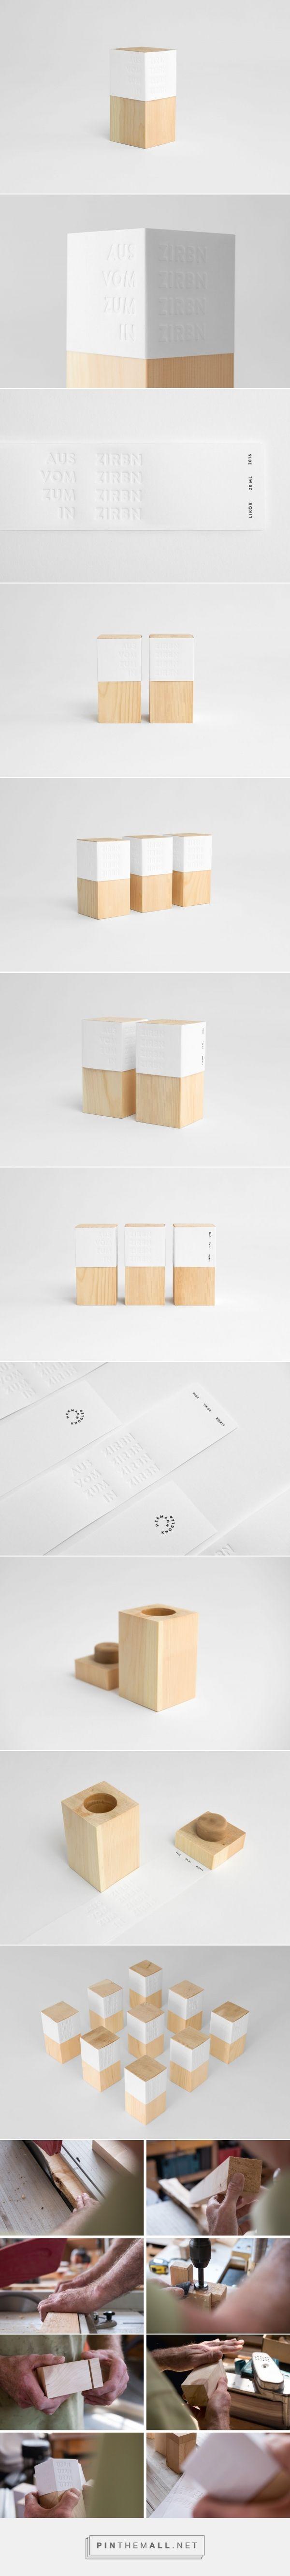 Zirbnlikör spirits and liquors packaging design by Zunder - http://www.packagingoftheworld.com/2017/02/zirbnlikor.html